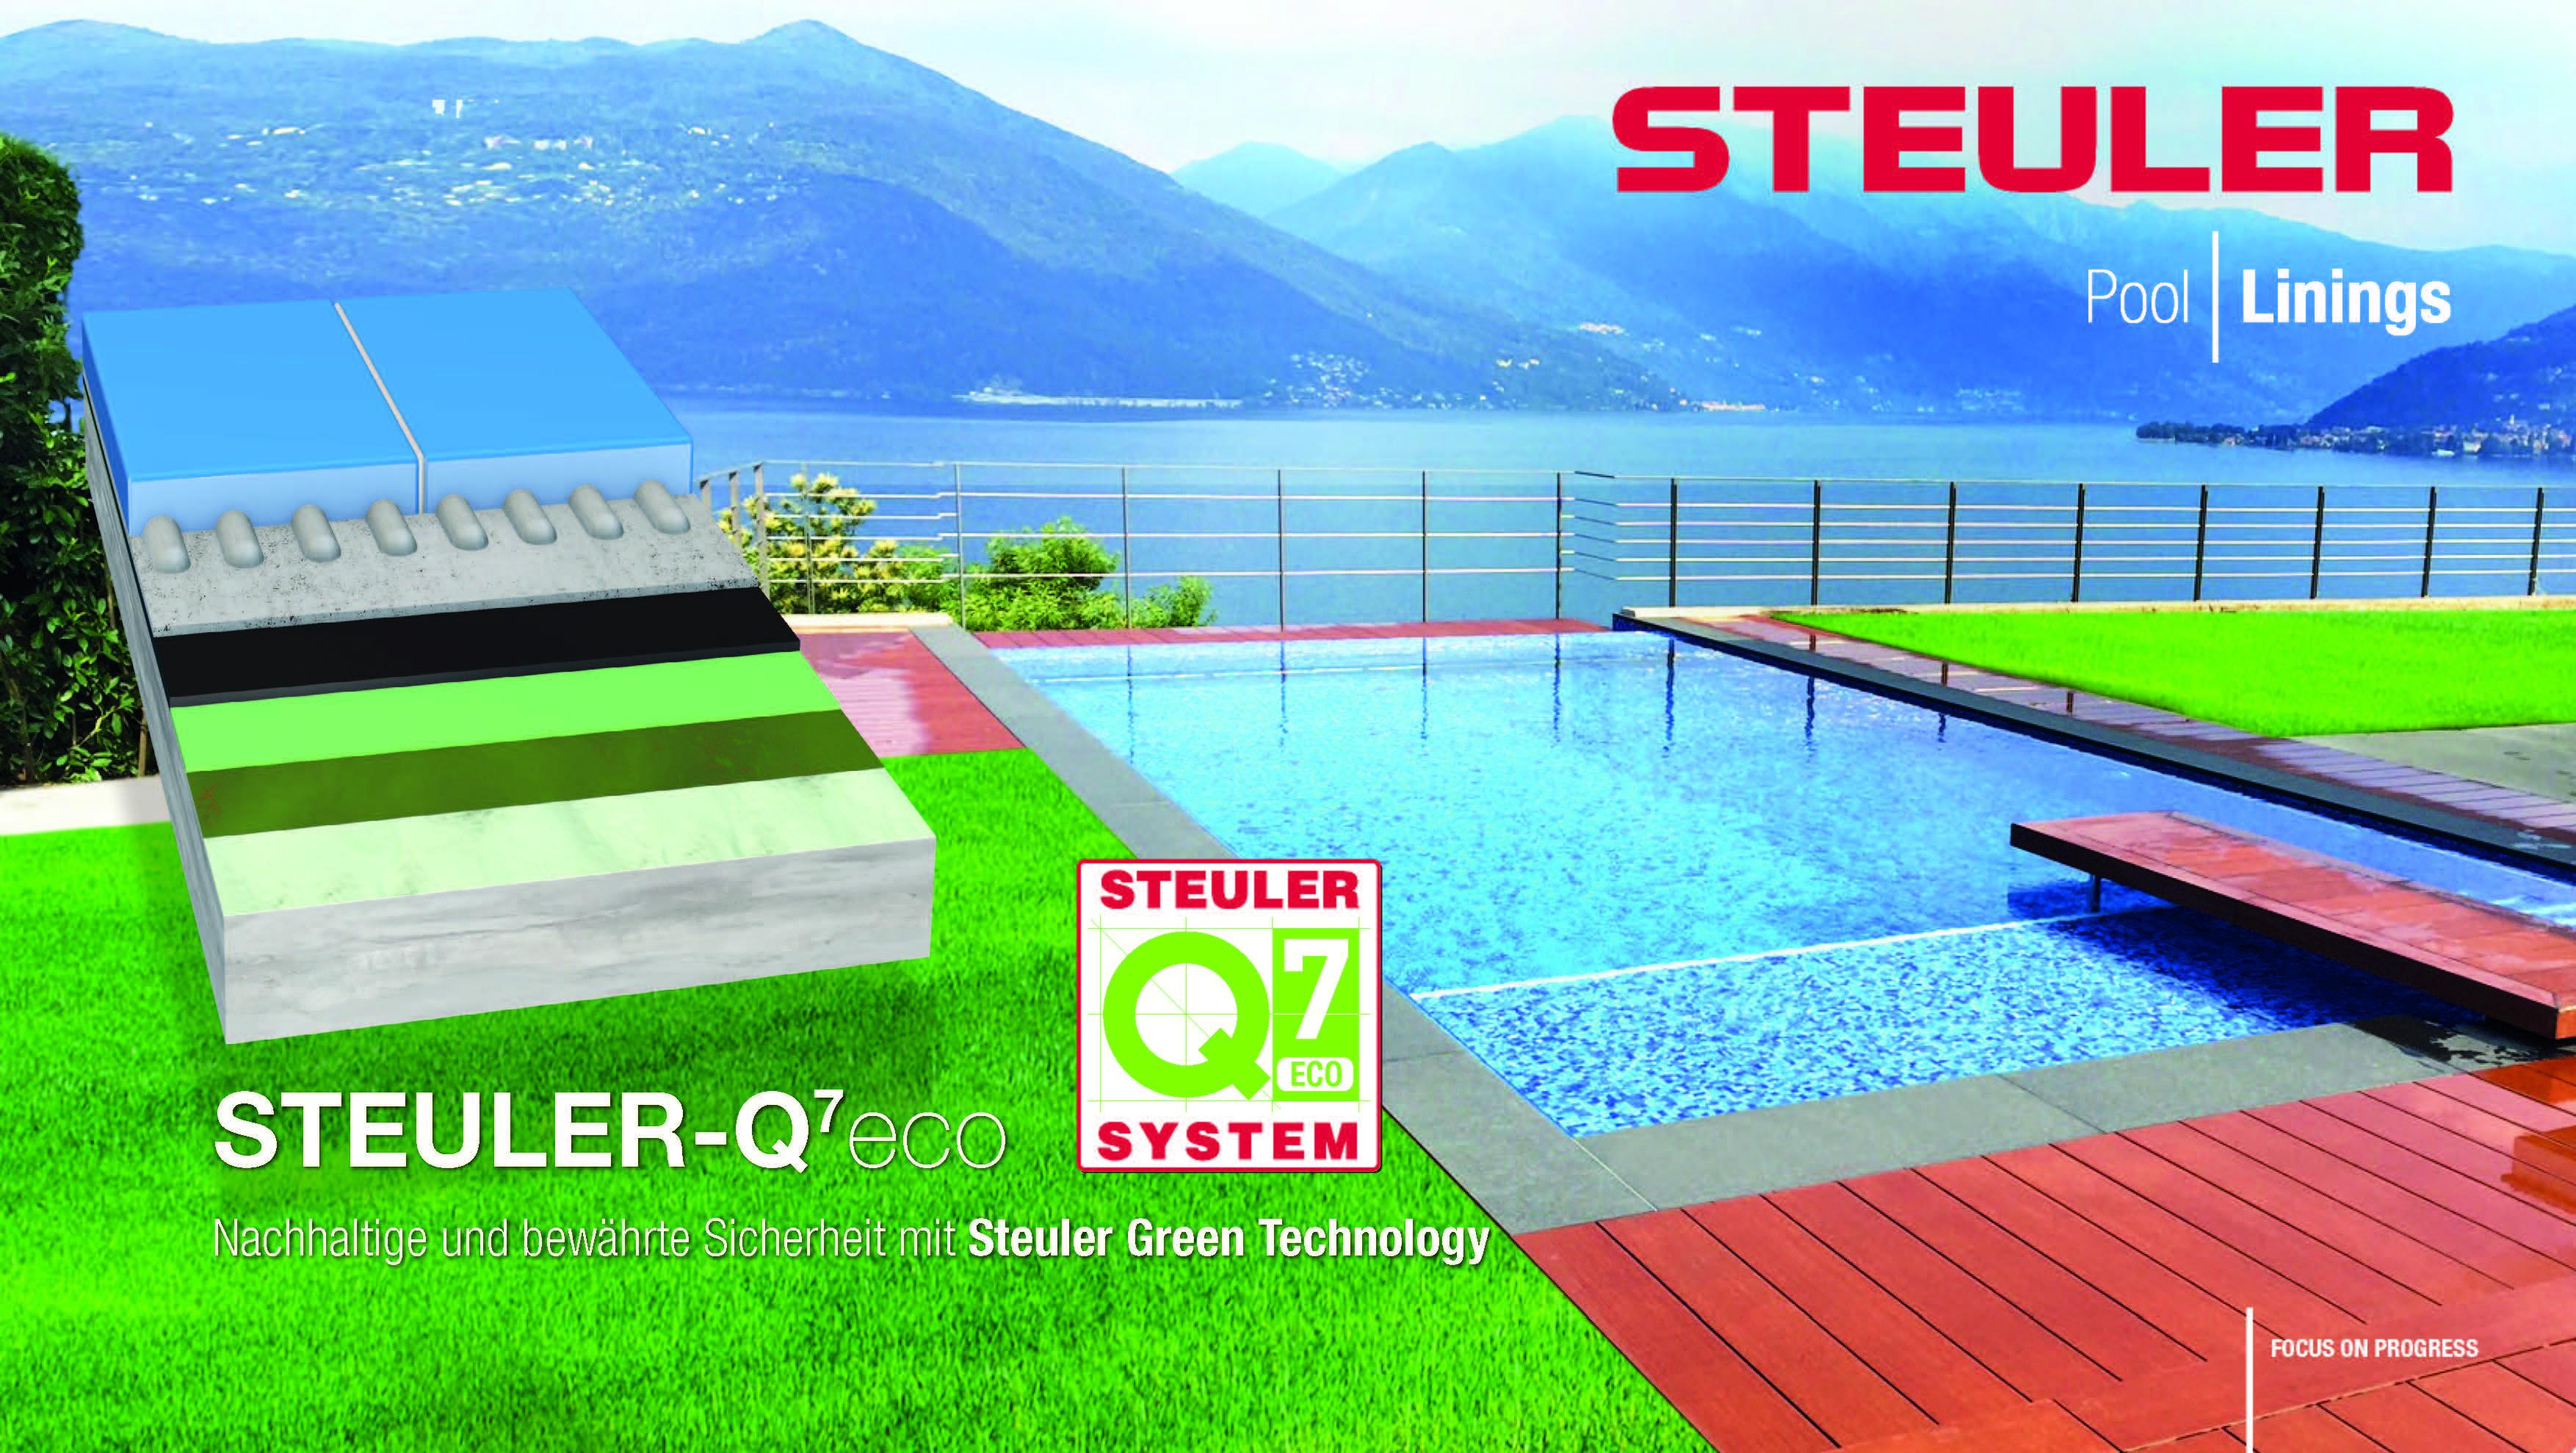 STEULER-Q7eco InnvoationAward